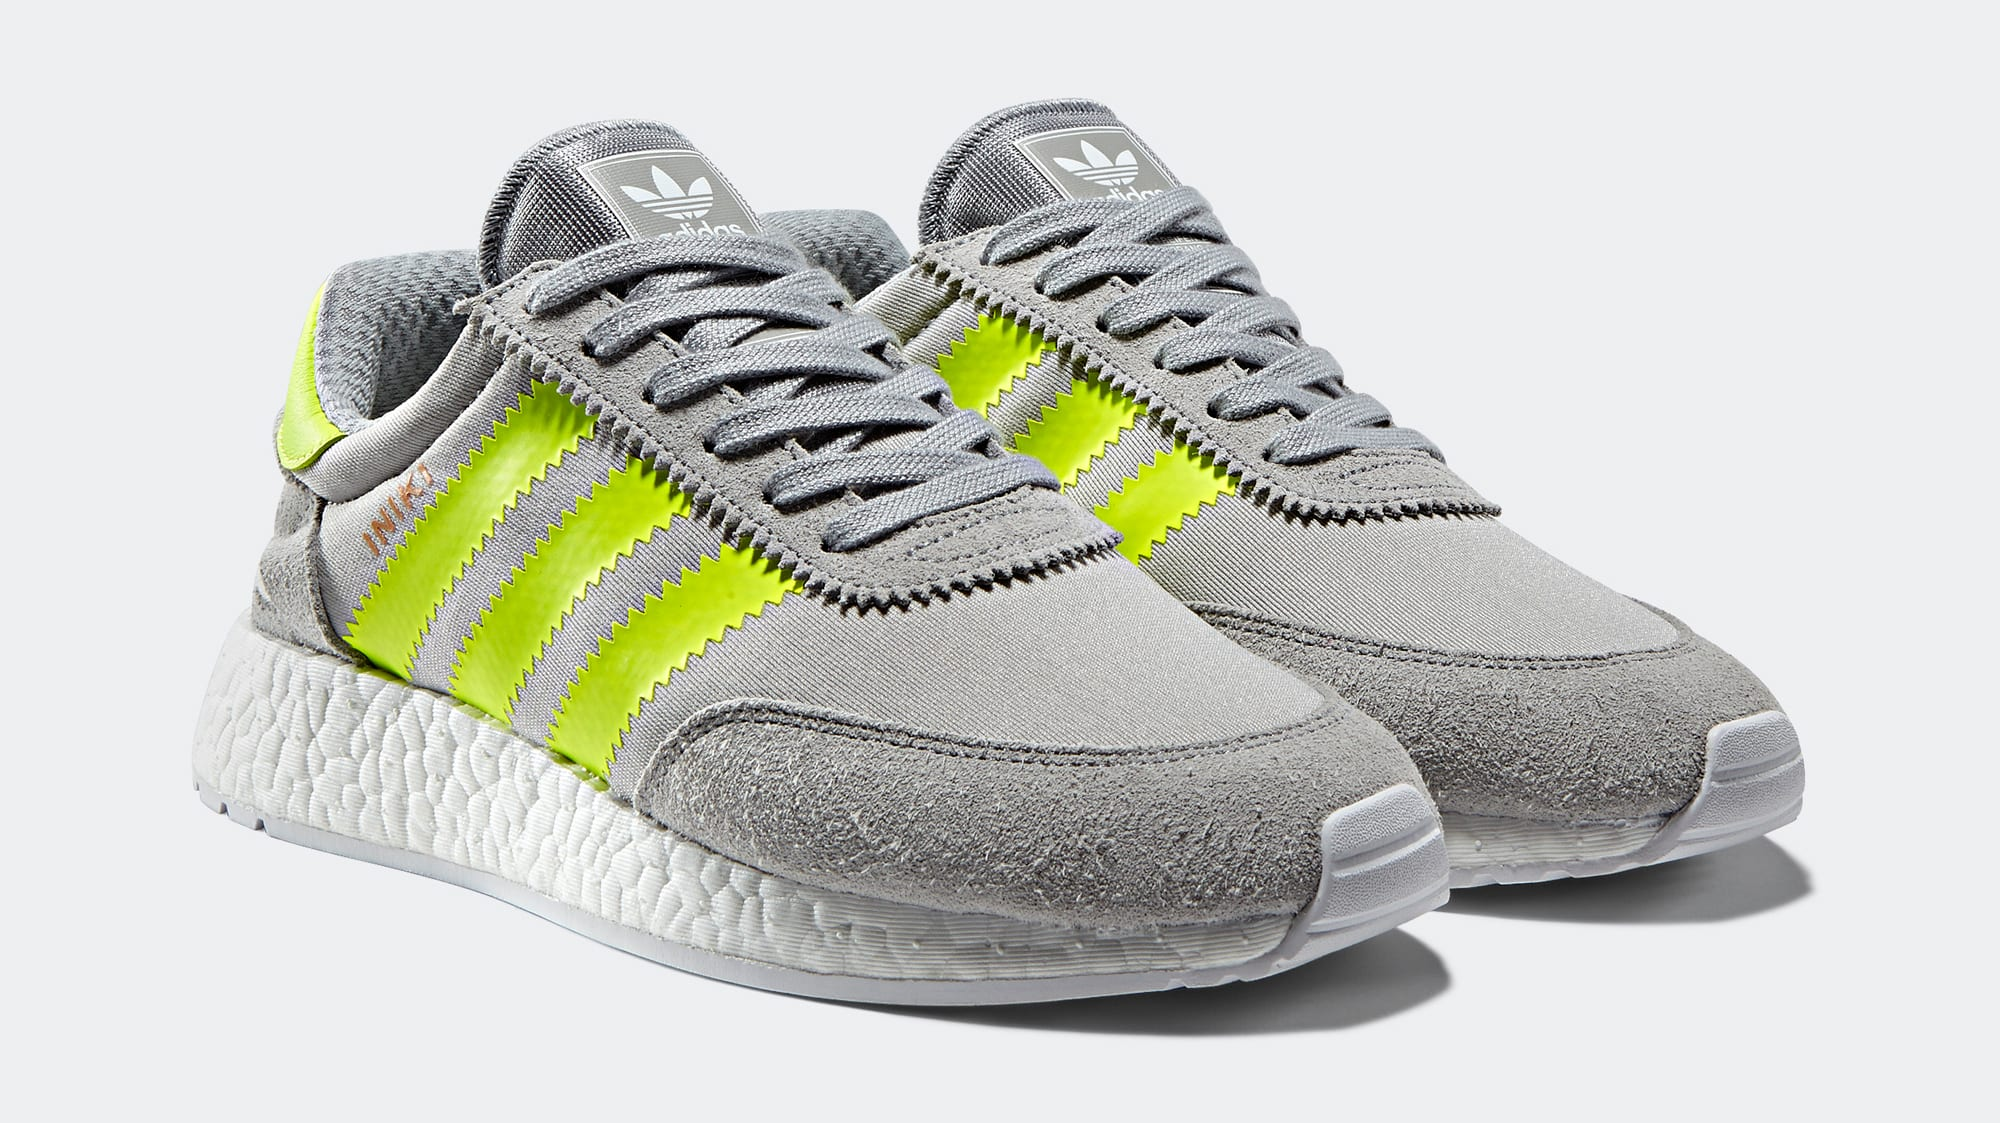 Adidas Iniki Yellow Grey